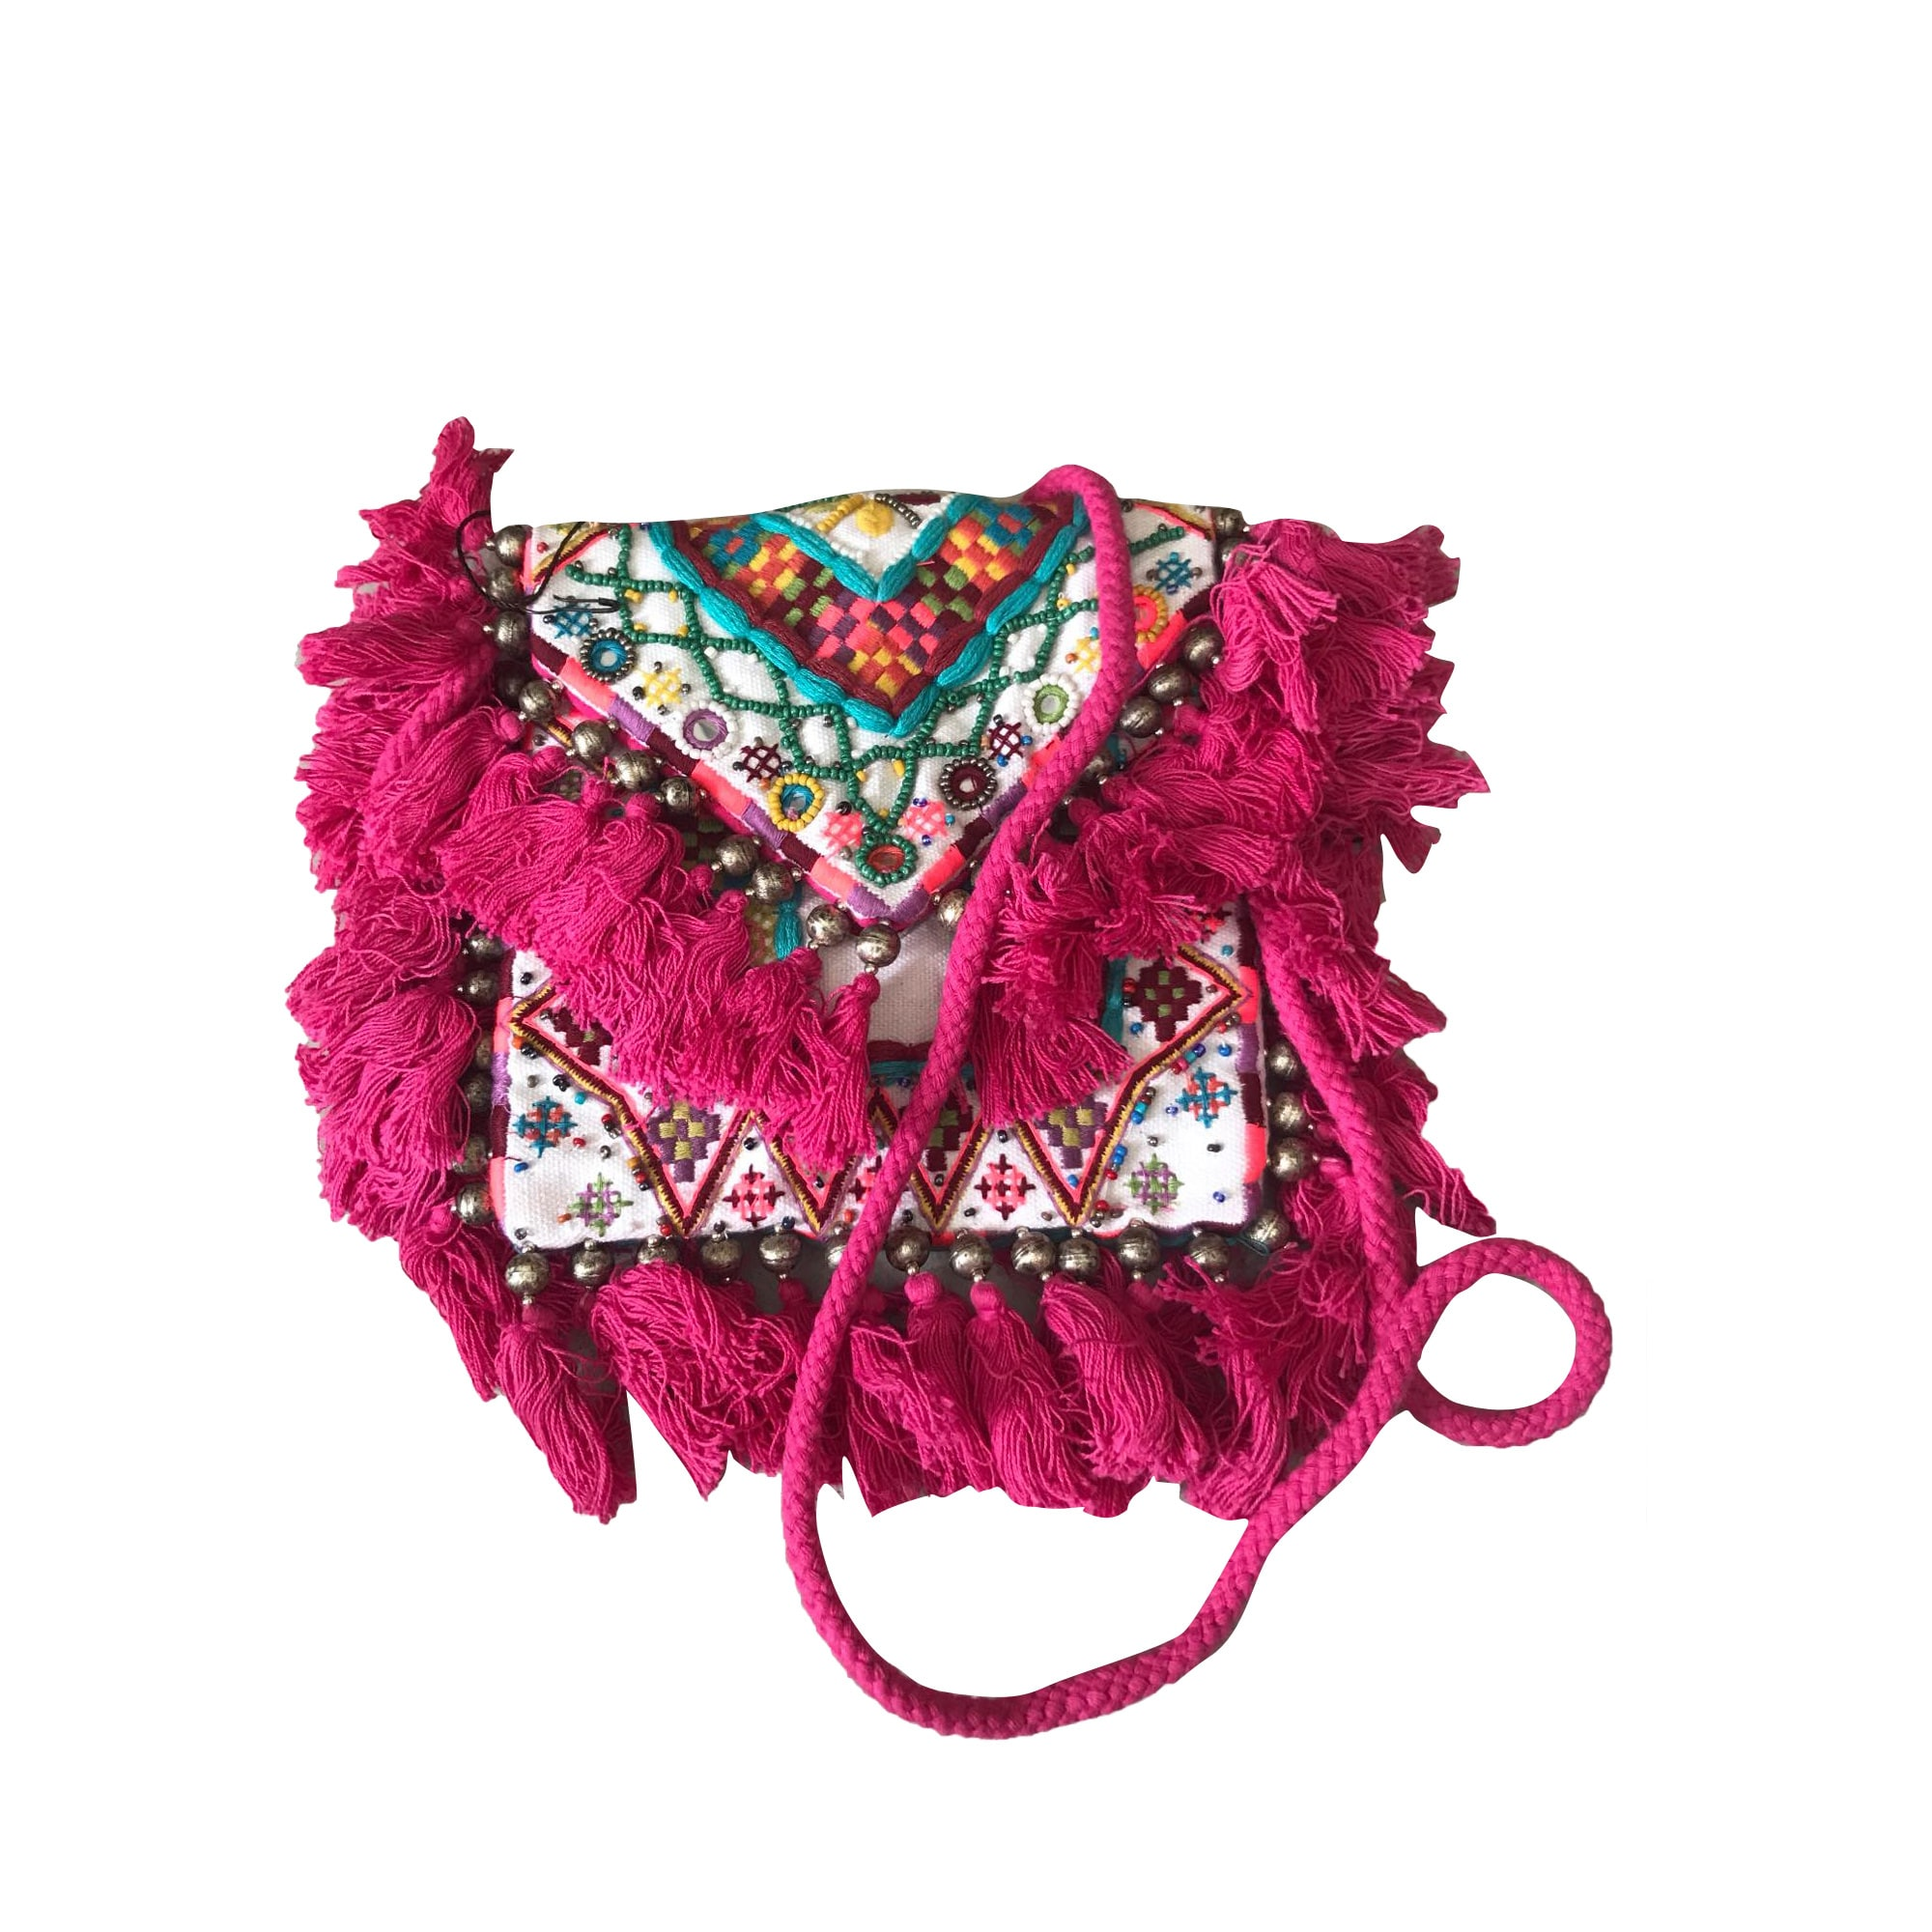 Non-Leather Shoulder Bag ANTIK BATIK Pink, fuchsia, light pink